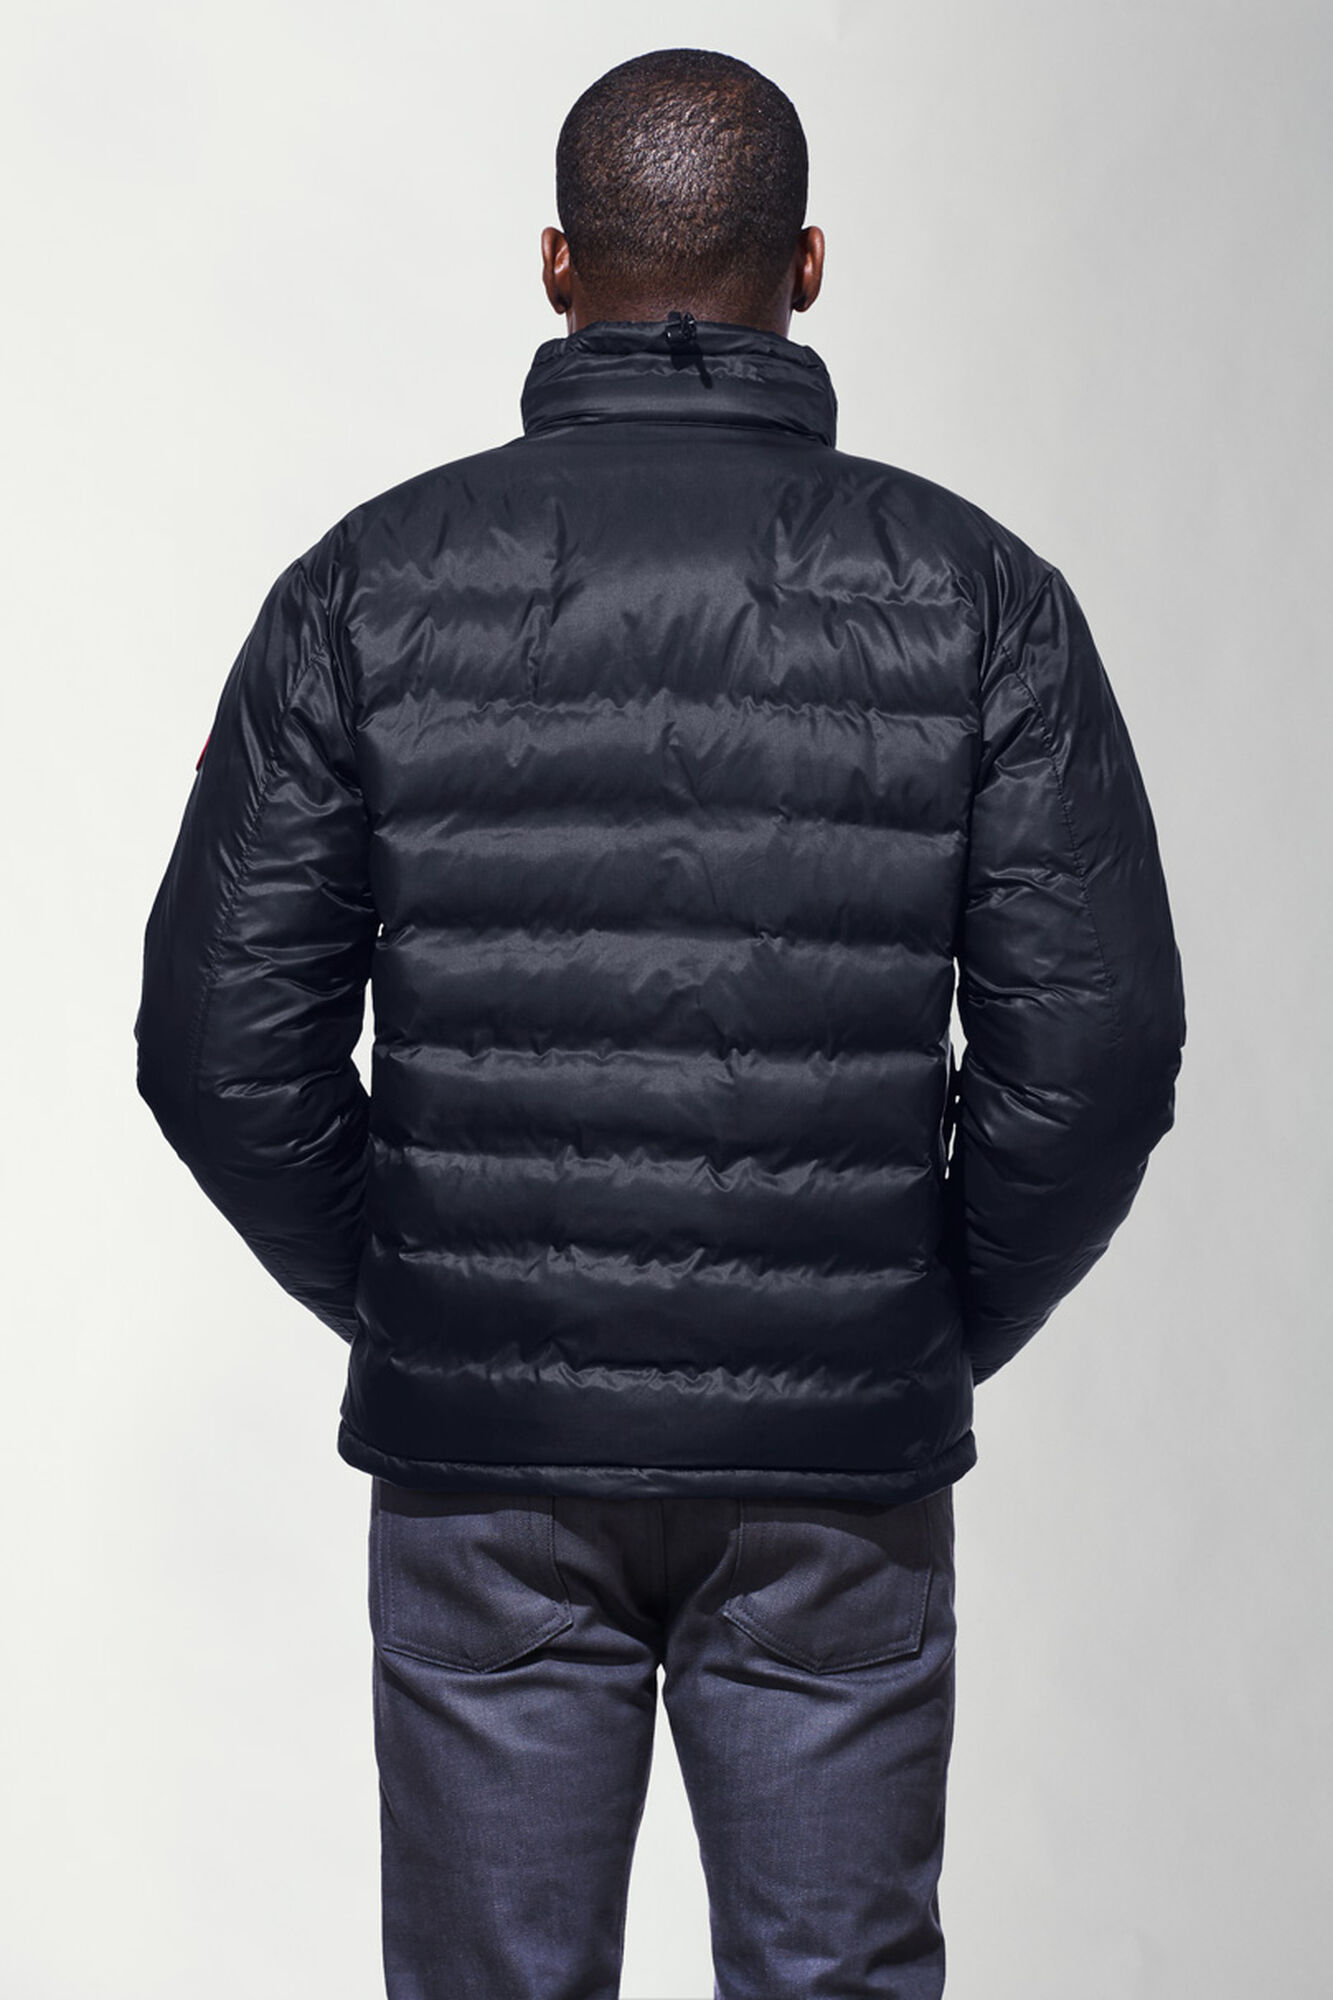 Canadian Goose Jackets